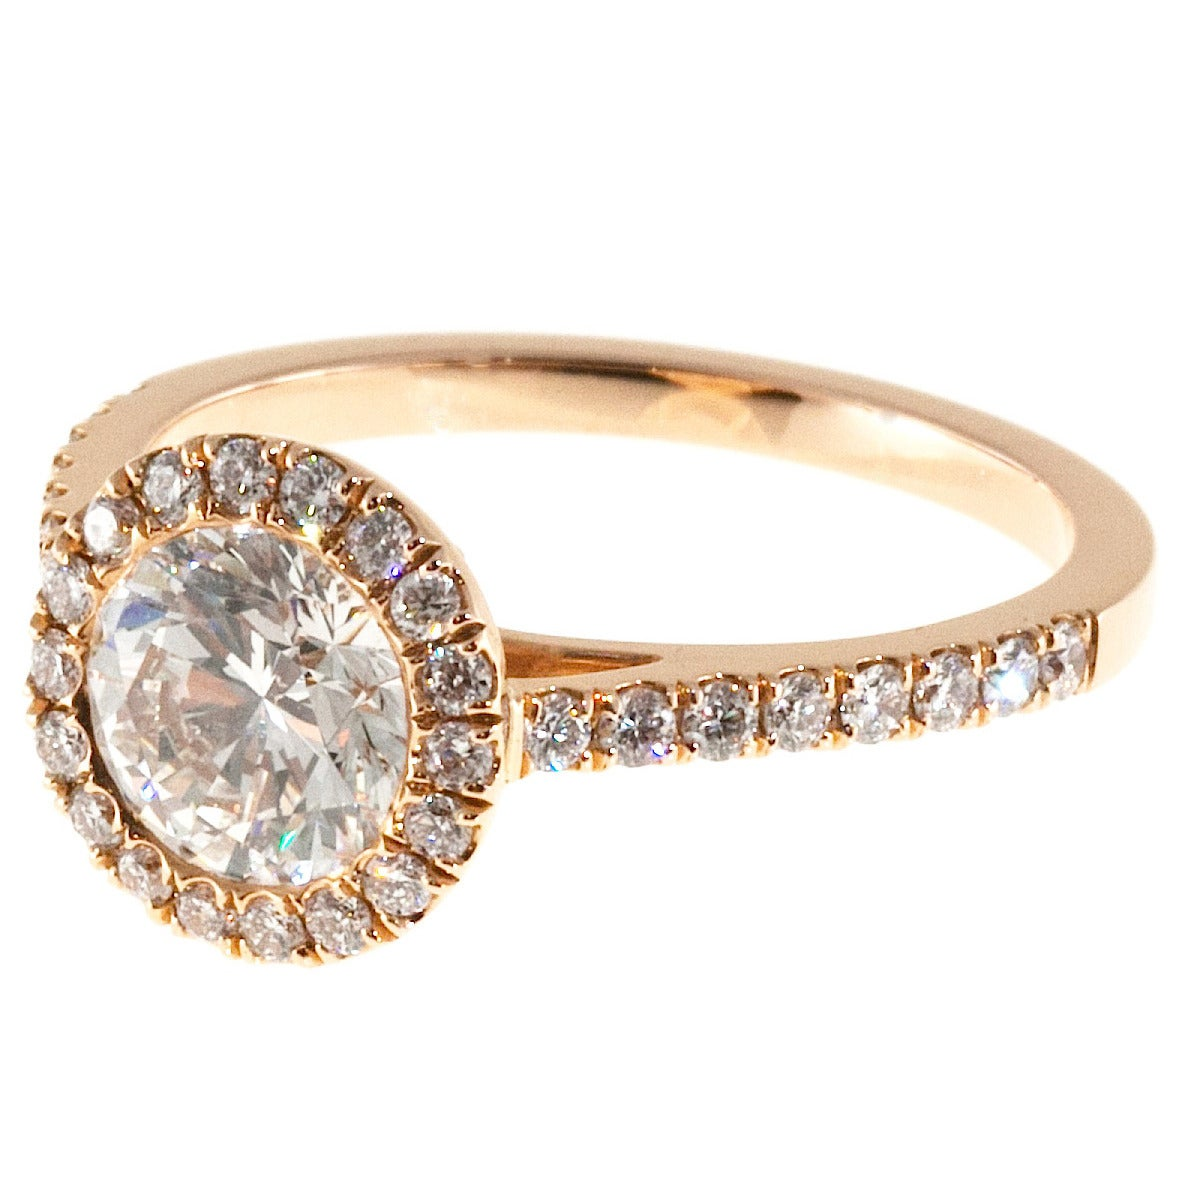 Peter Suchy GIA Certified 1.06 Carat Diamond Halo Rose Gold Engagement Ring 1